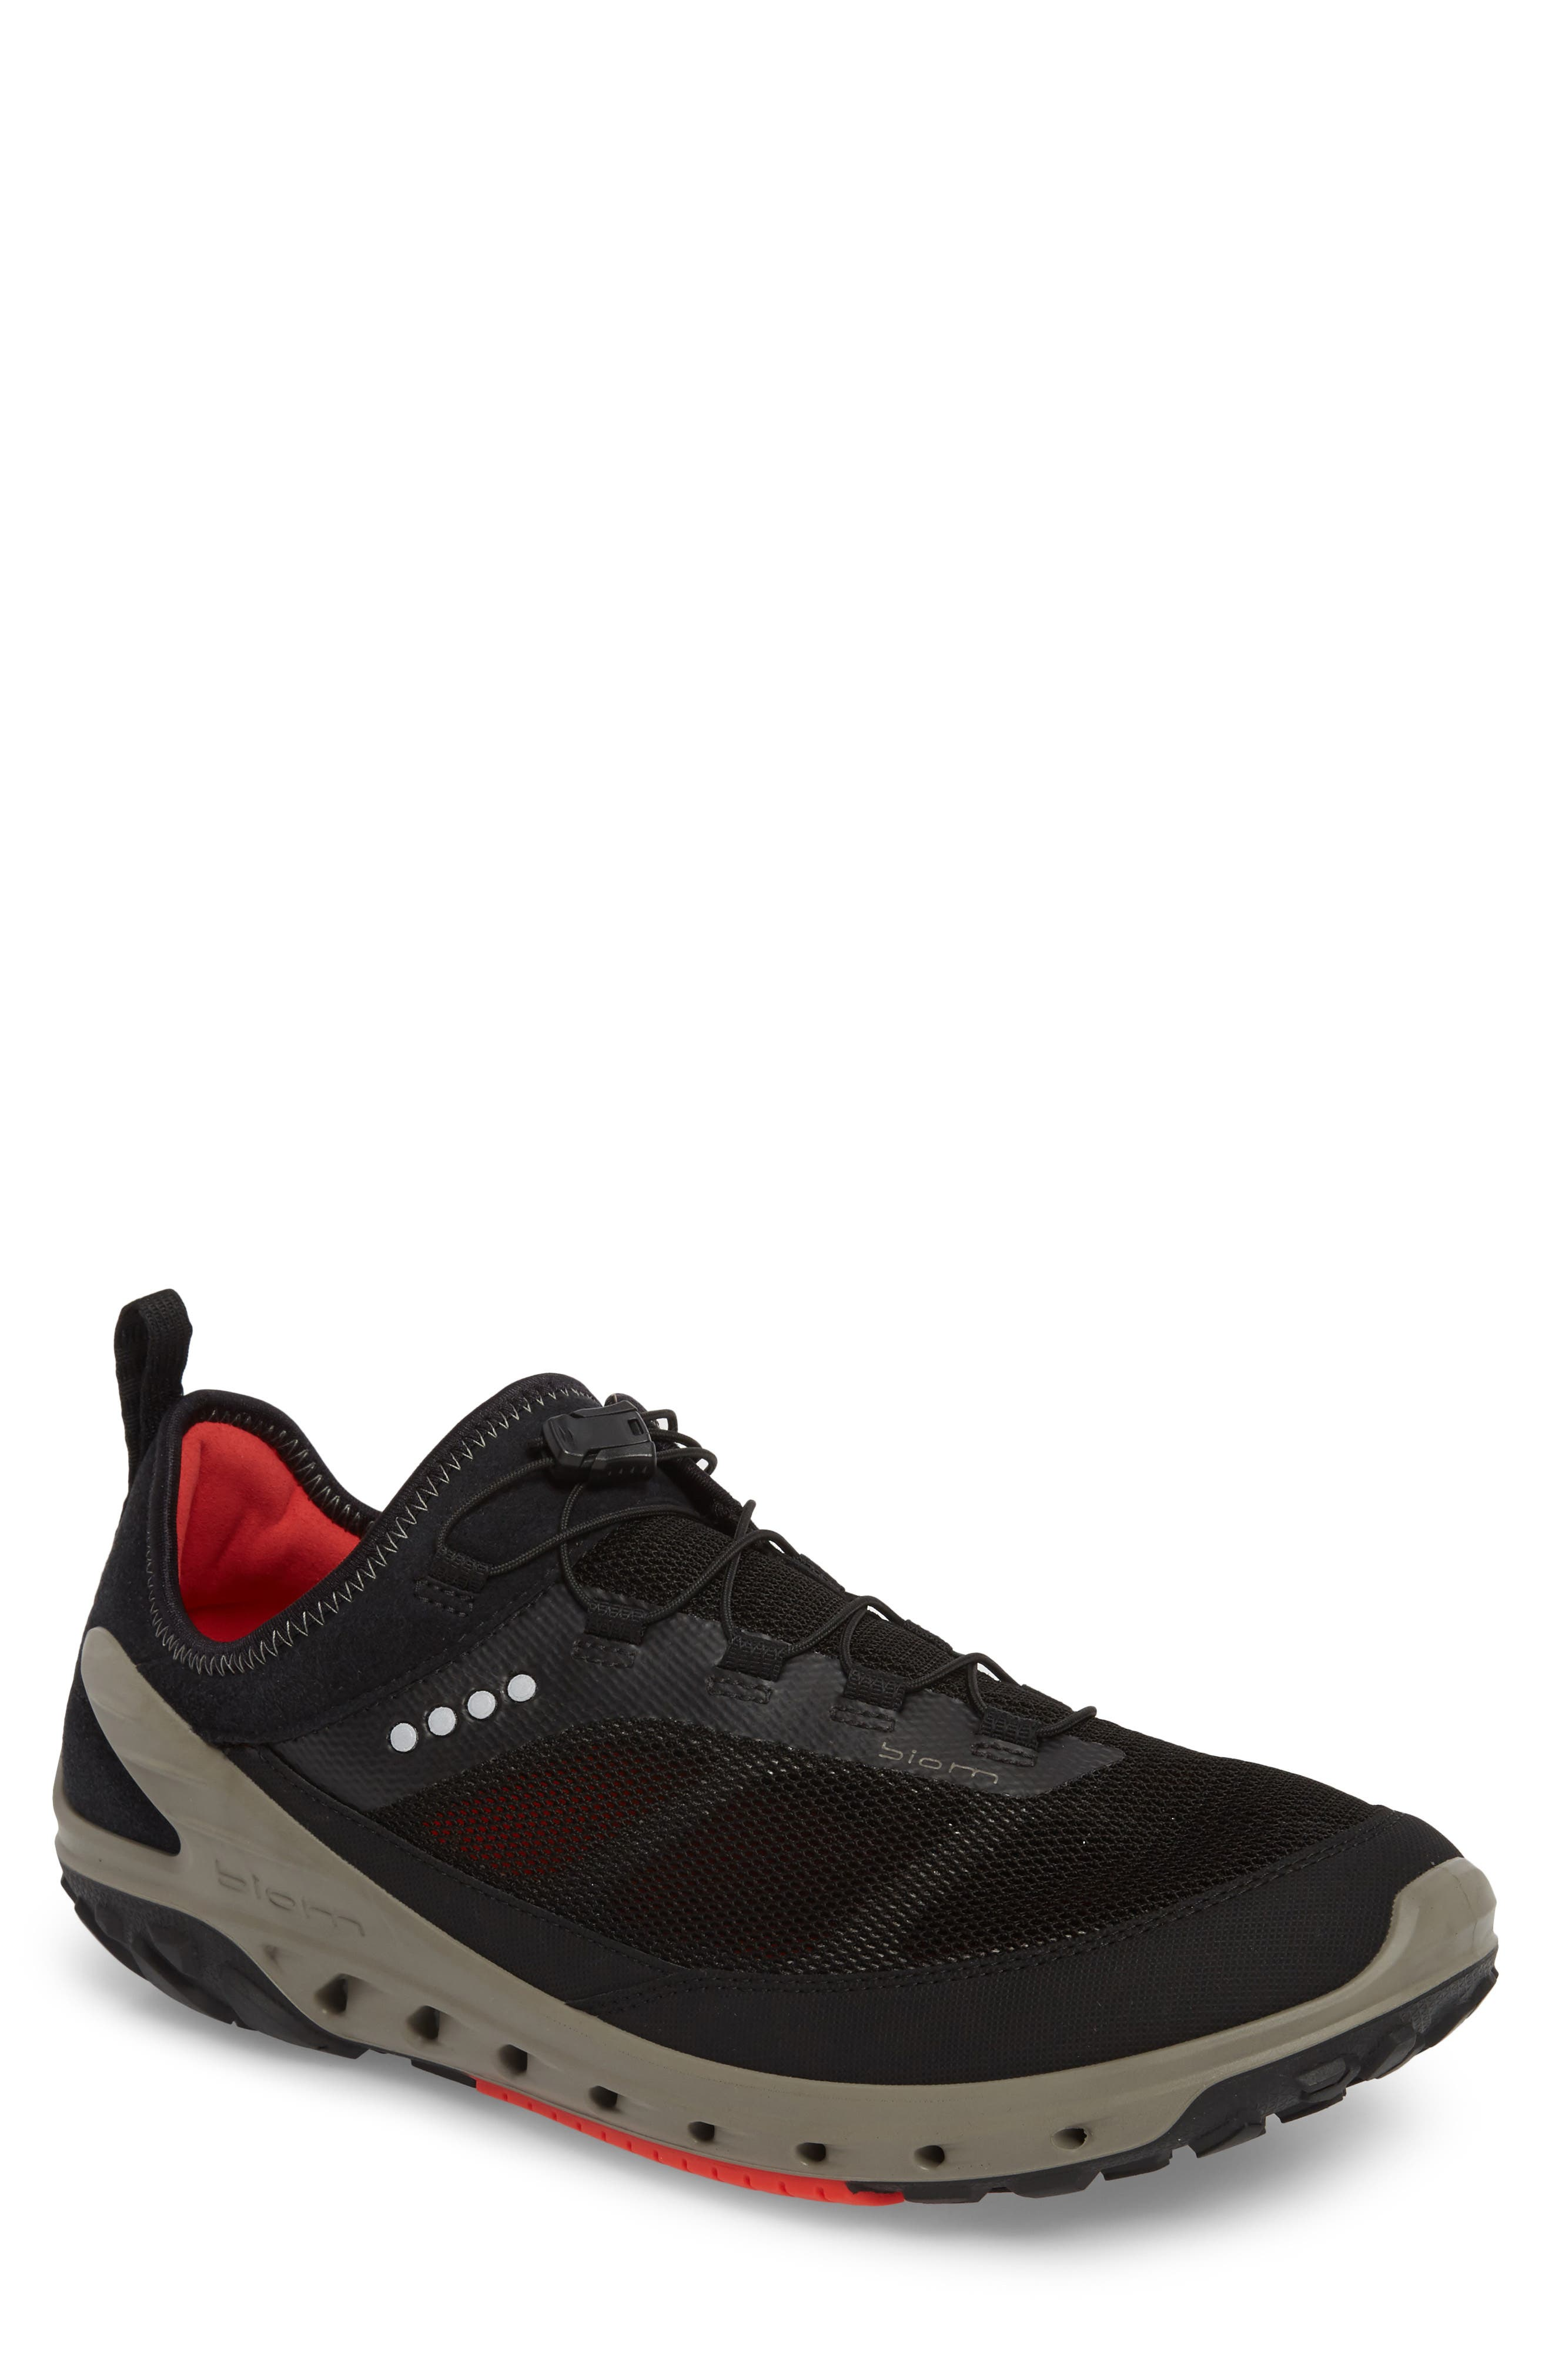 Biom Venture Sneaker,                             Main thumbnail 1, color,                             Black Leather